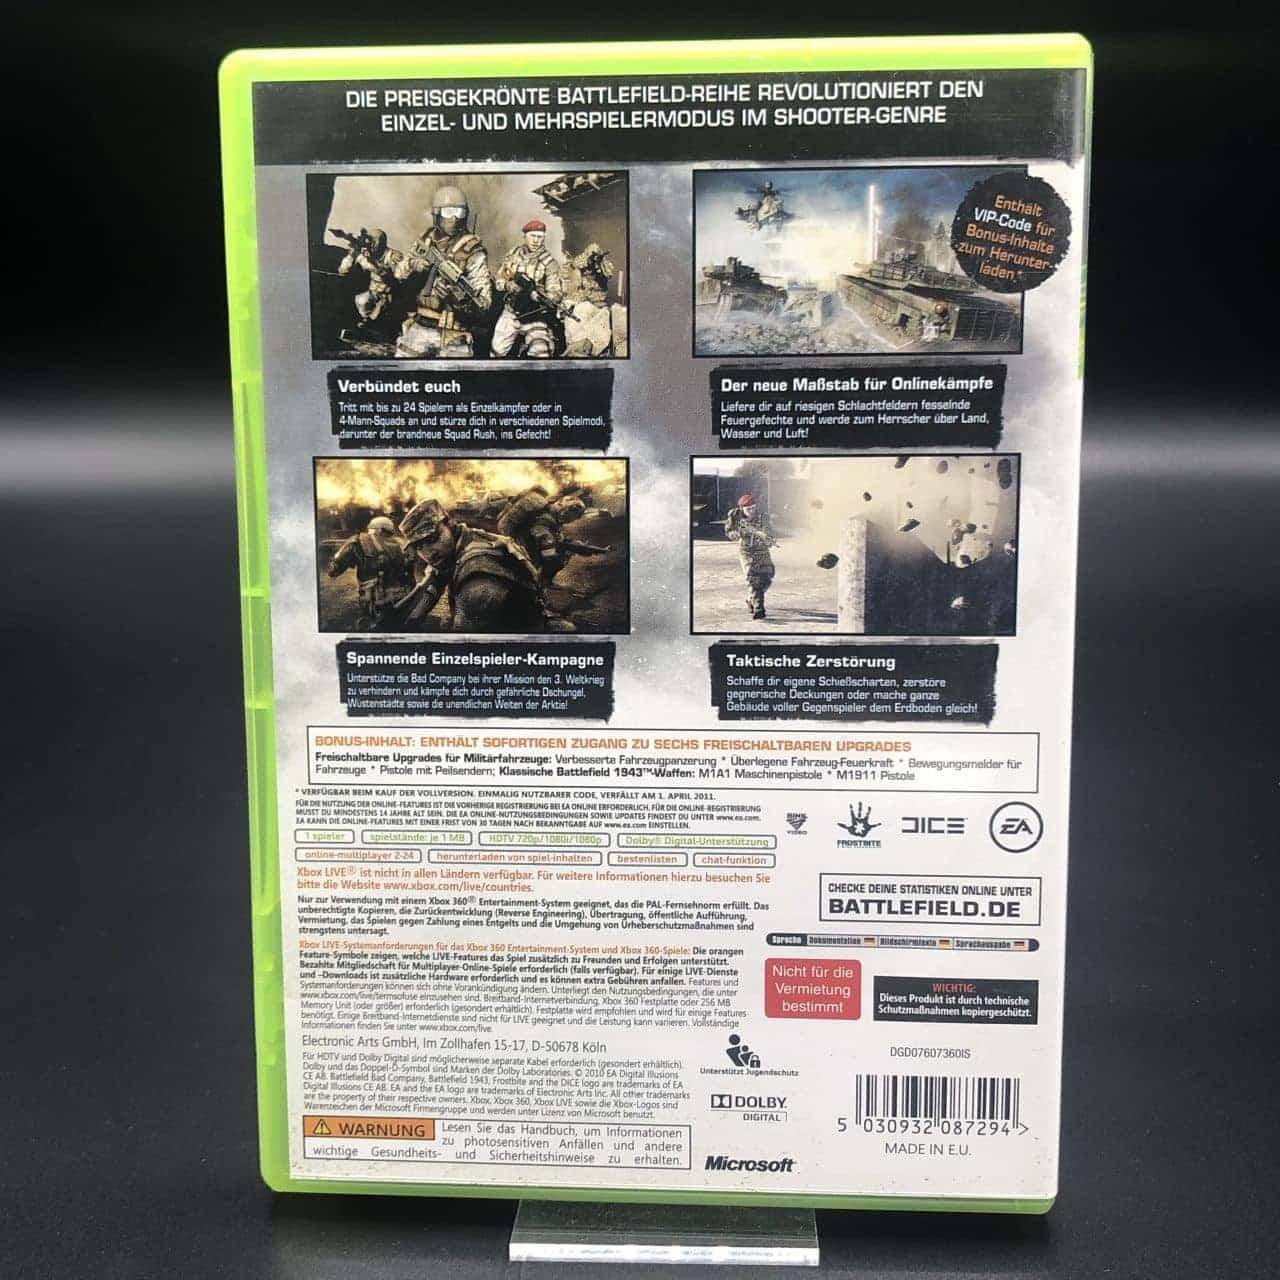 Battlefield: Bad Company 2 (Limited Edition) (Komplett) (Sehr gut) XBOX 360 (FSK18)